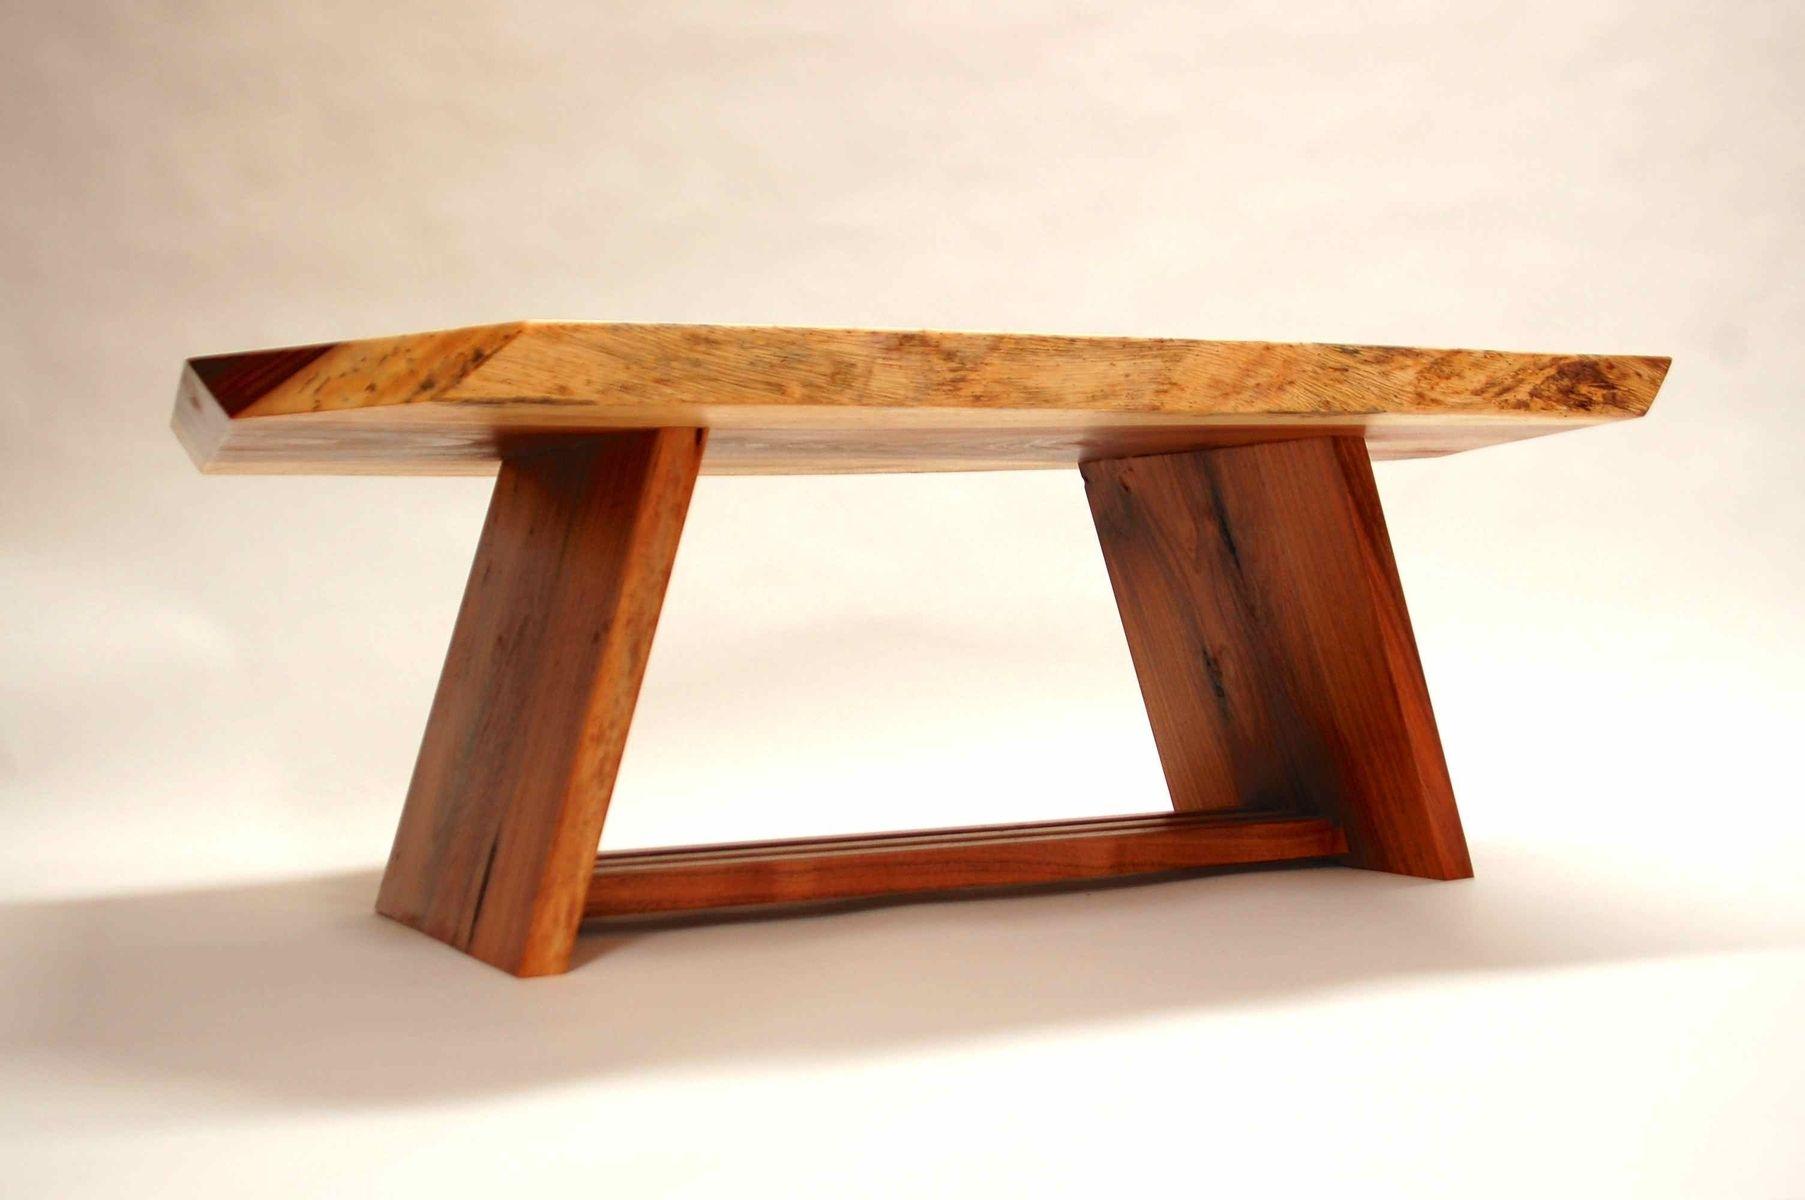 Handmade Acacia Coffee Table by CB Studios